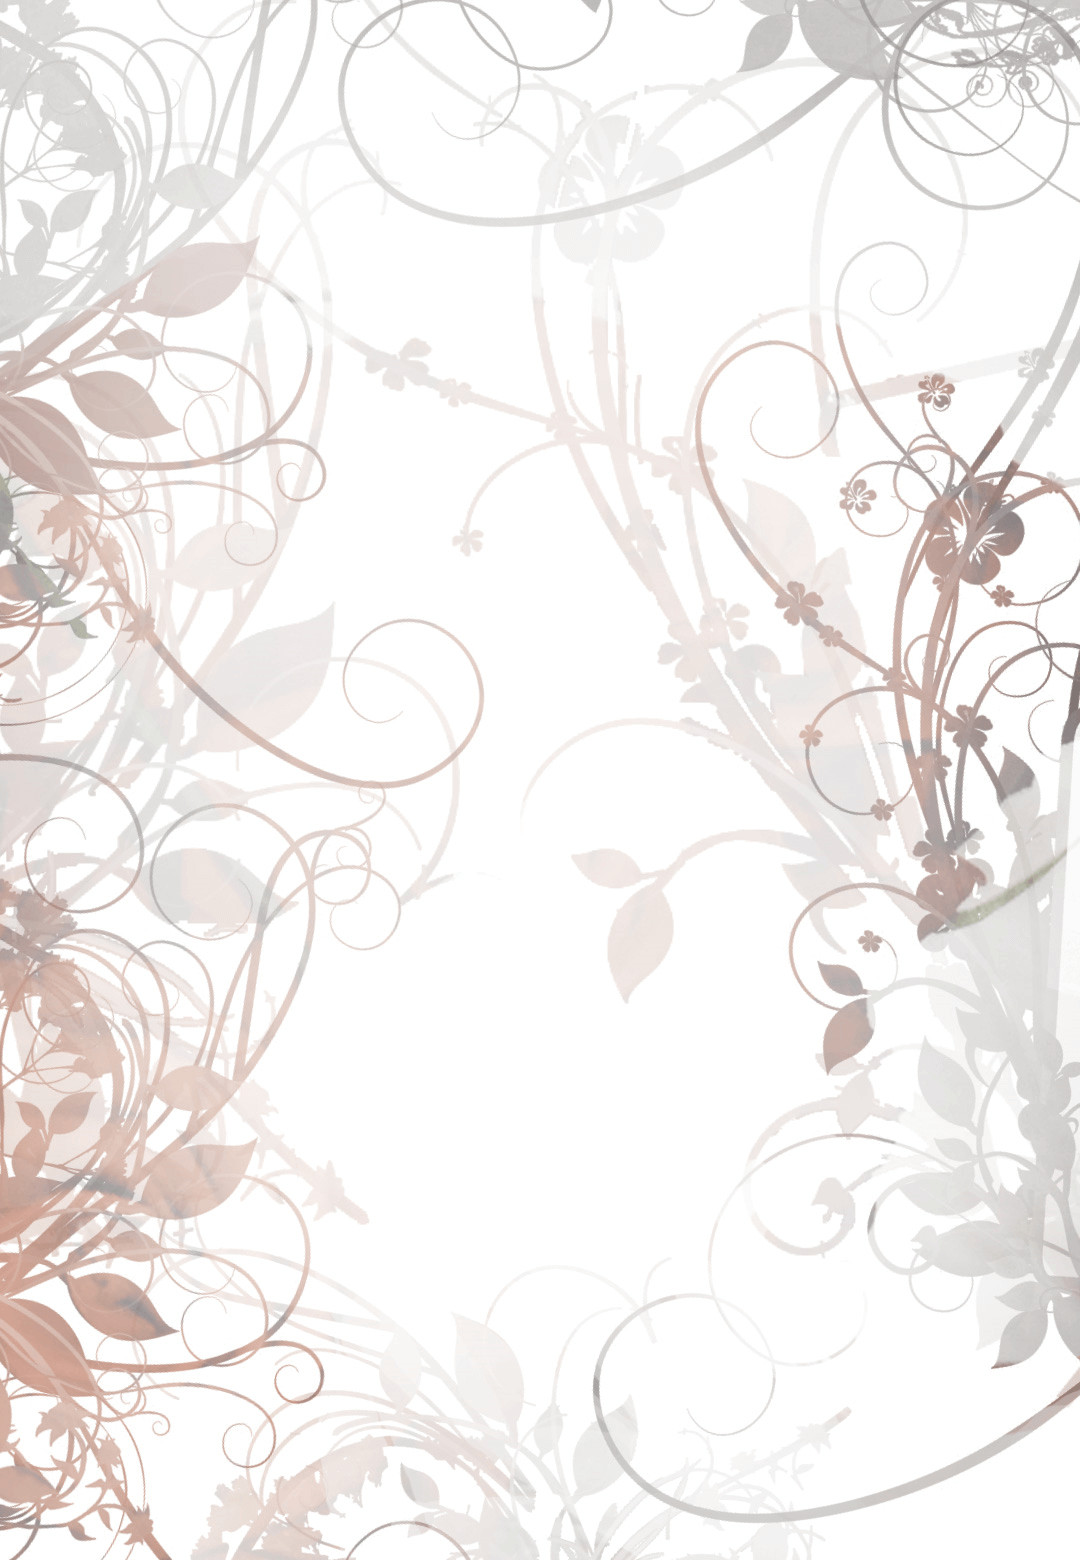 Bridal Bingo Free Template Blank Floral Bridal Shower Free Printable Bridal Shower